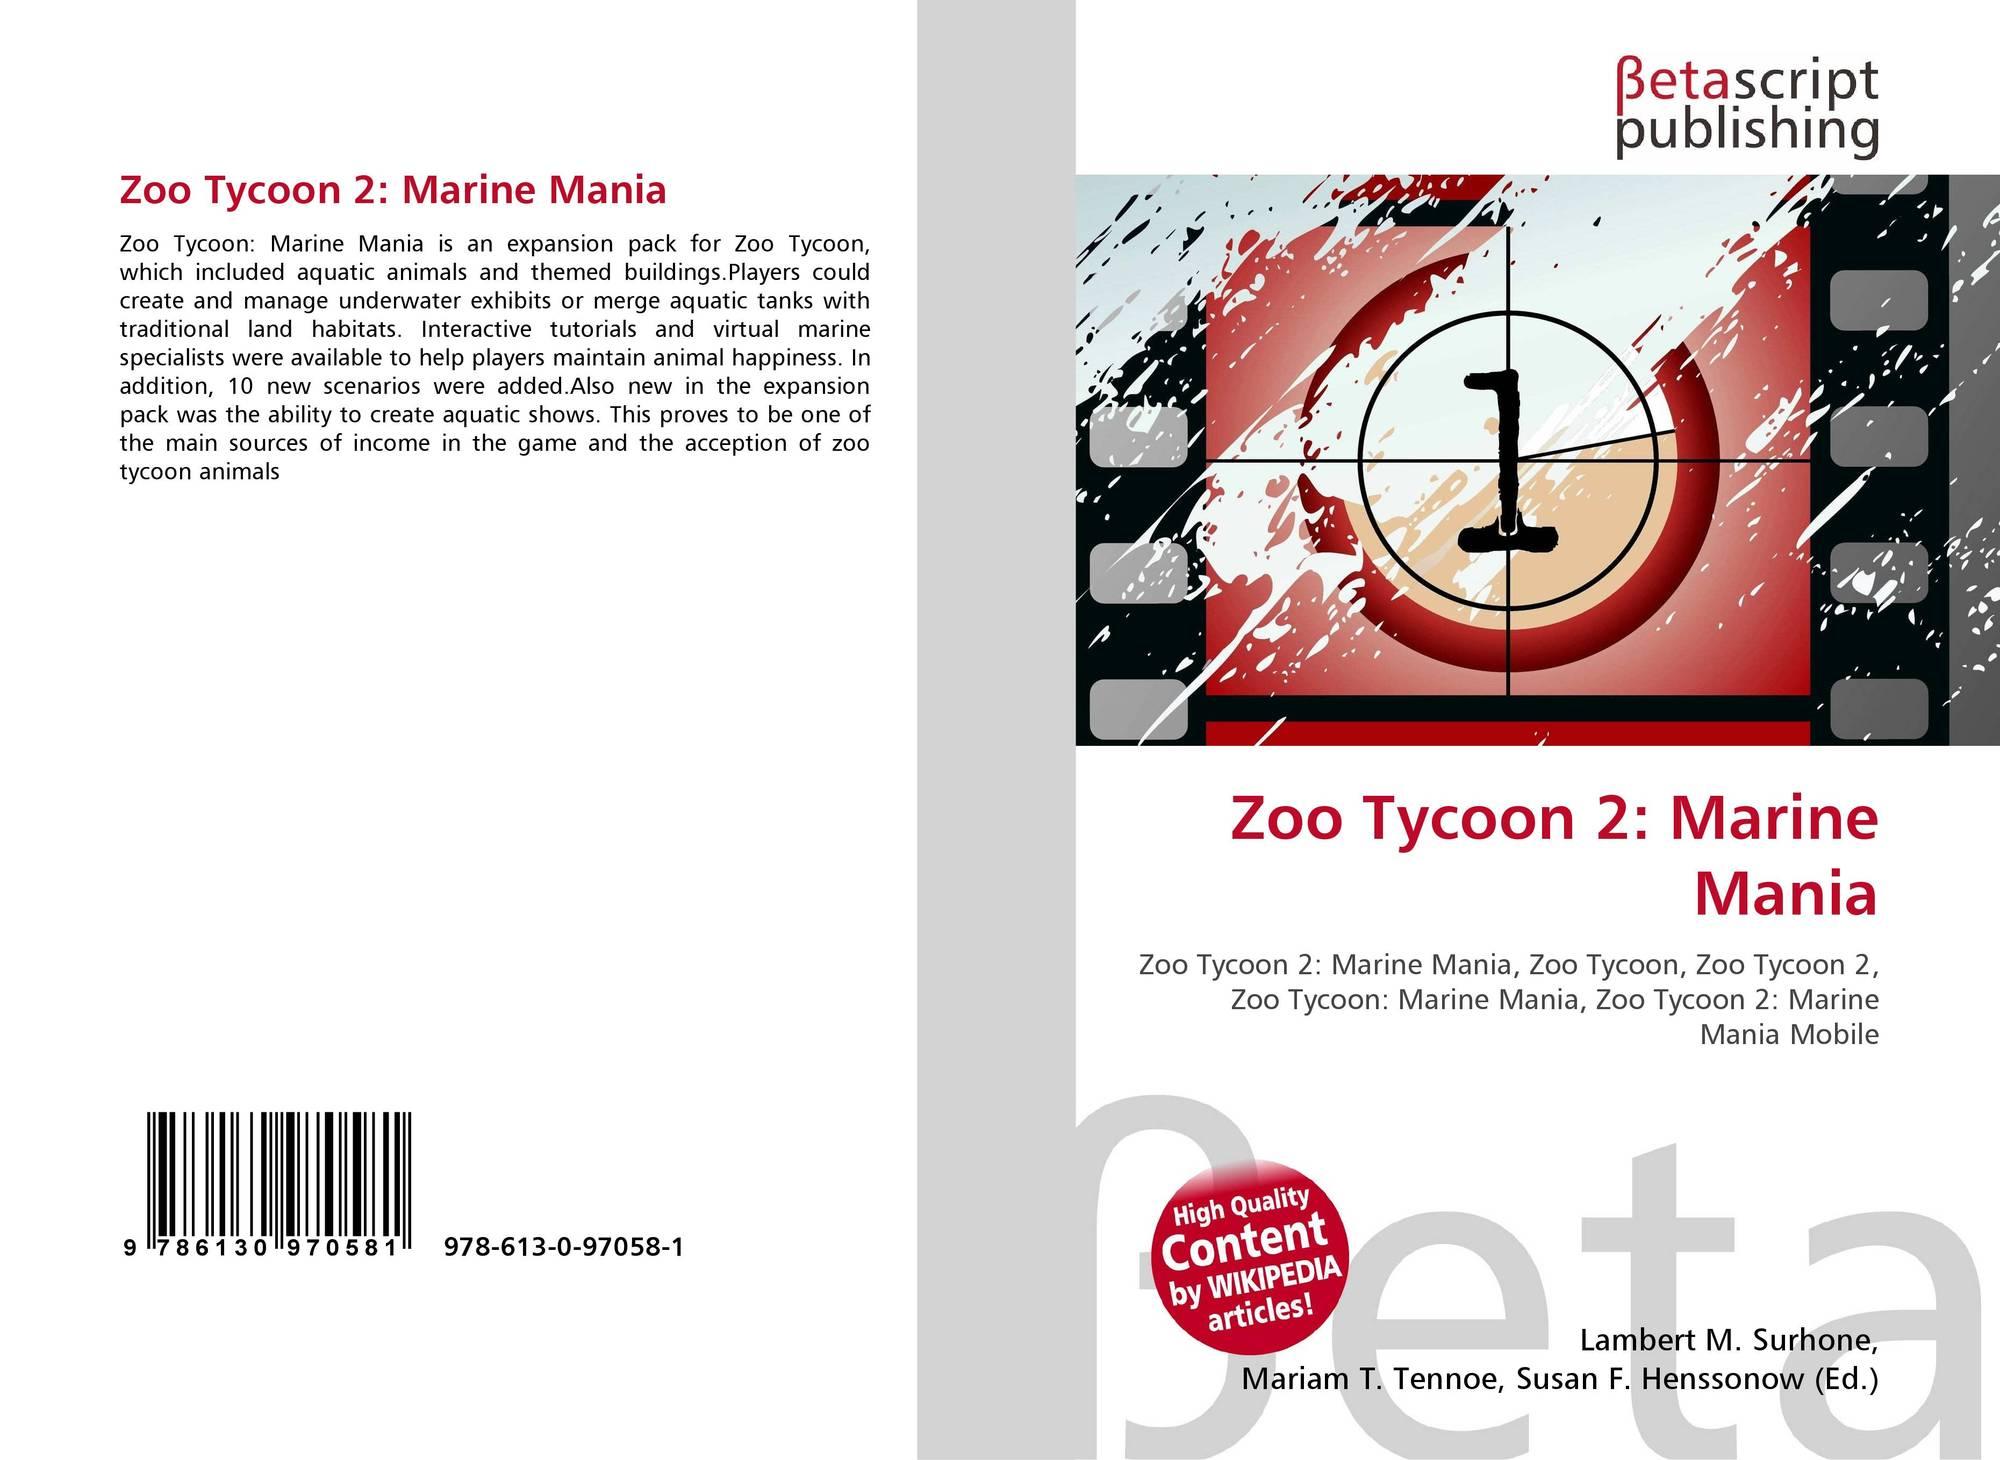 Zoo Tycoon 2: Marine Mania, 978-613-0-97058-1, 6130970587